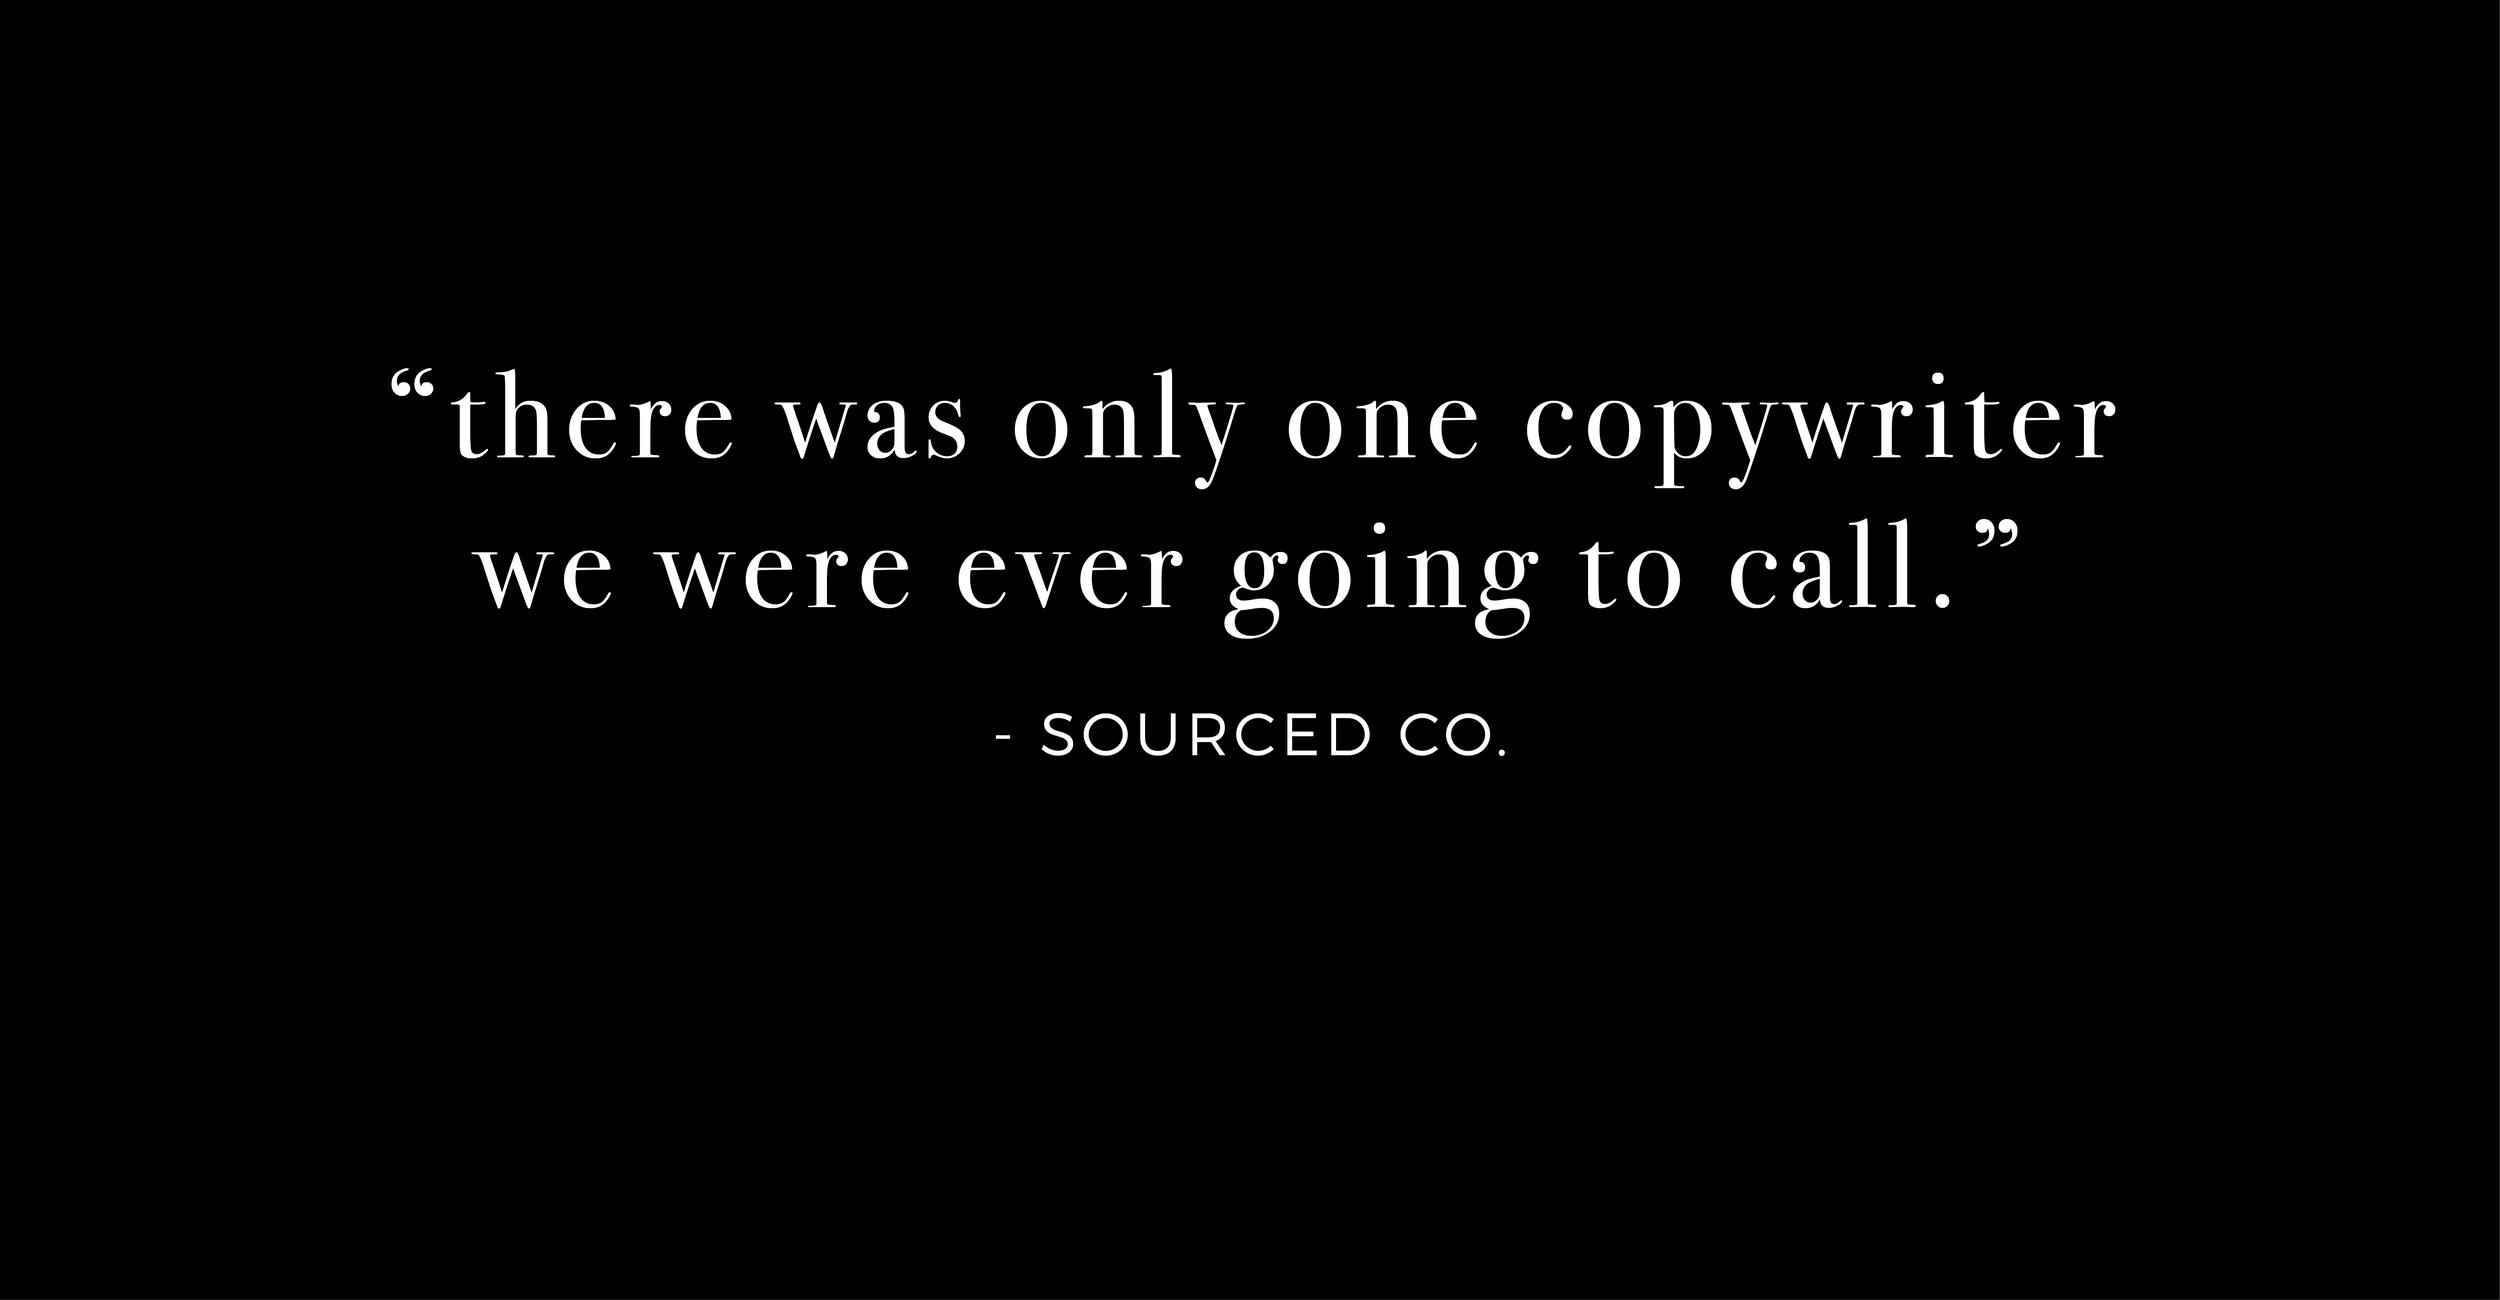 GG copywriting Las Vegas_ .png